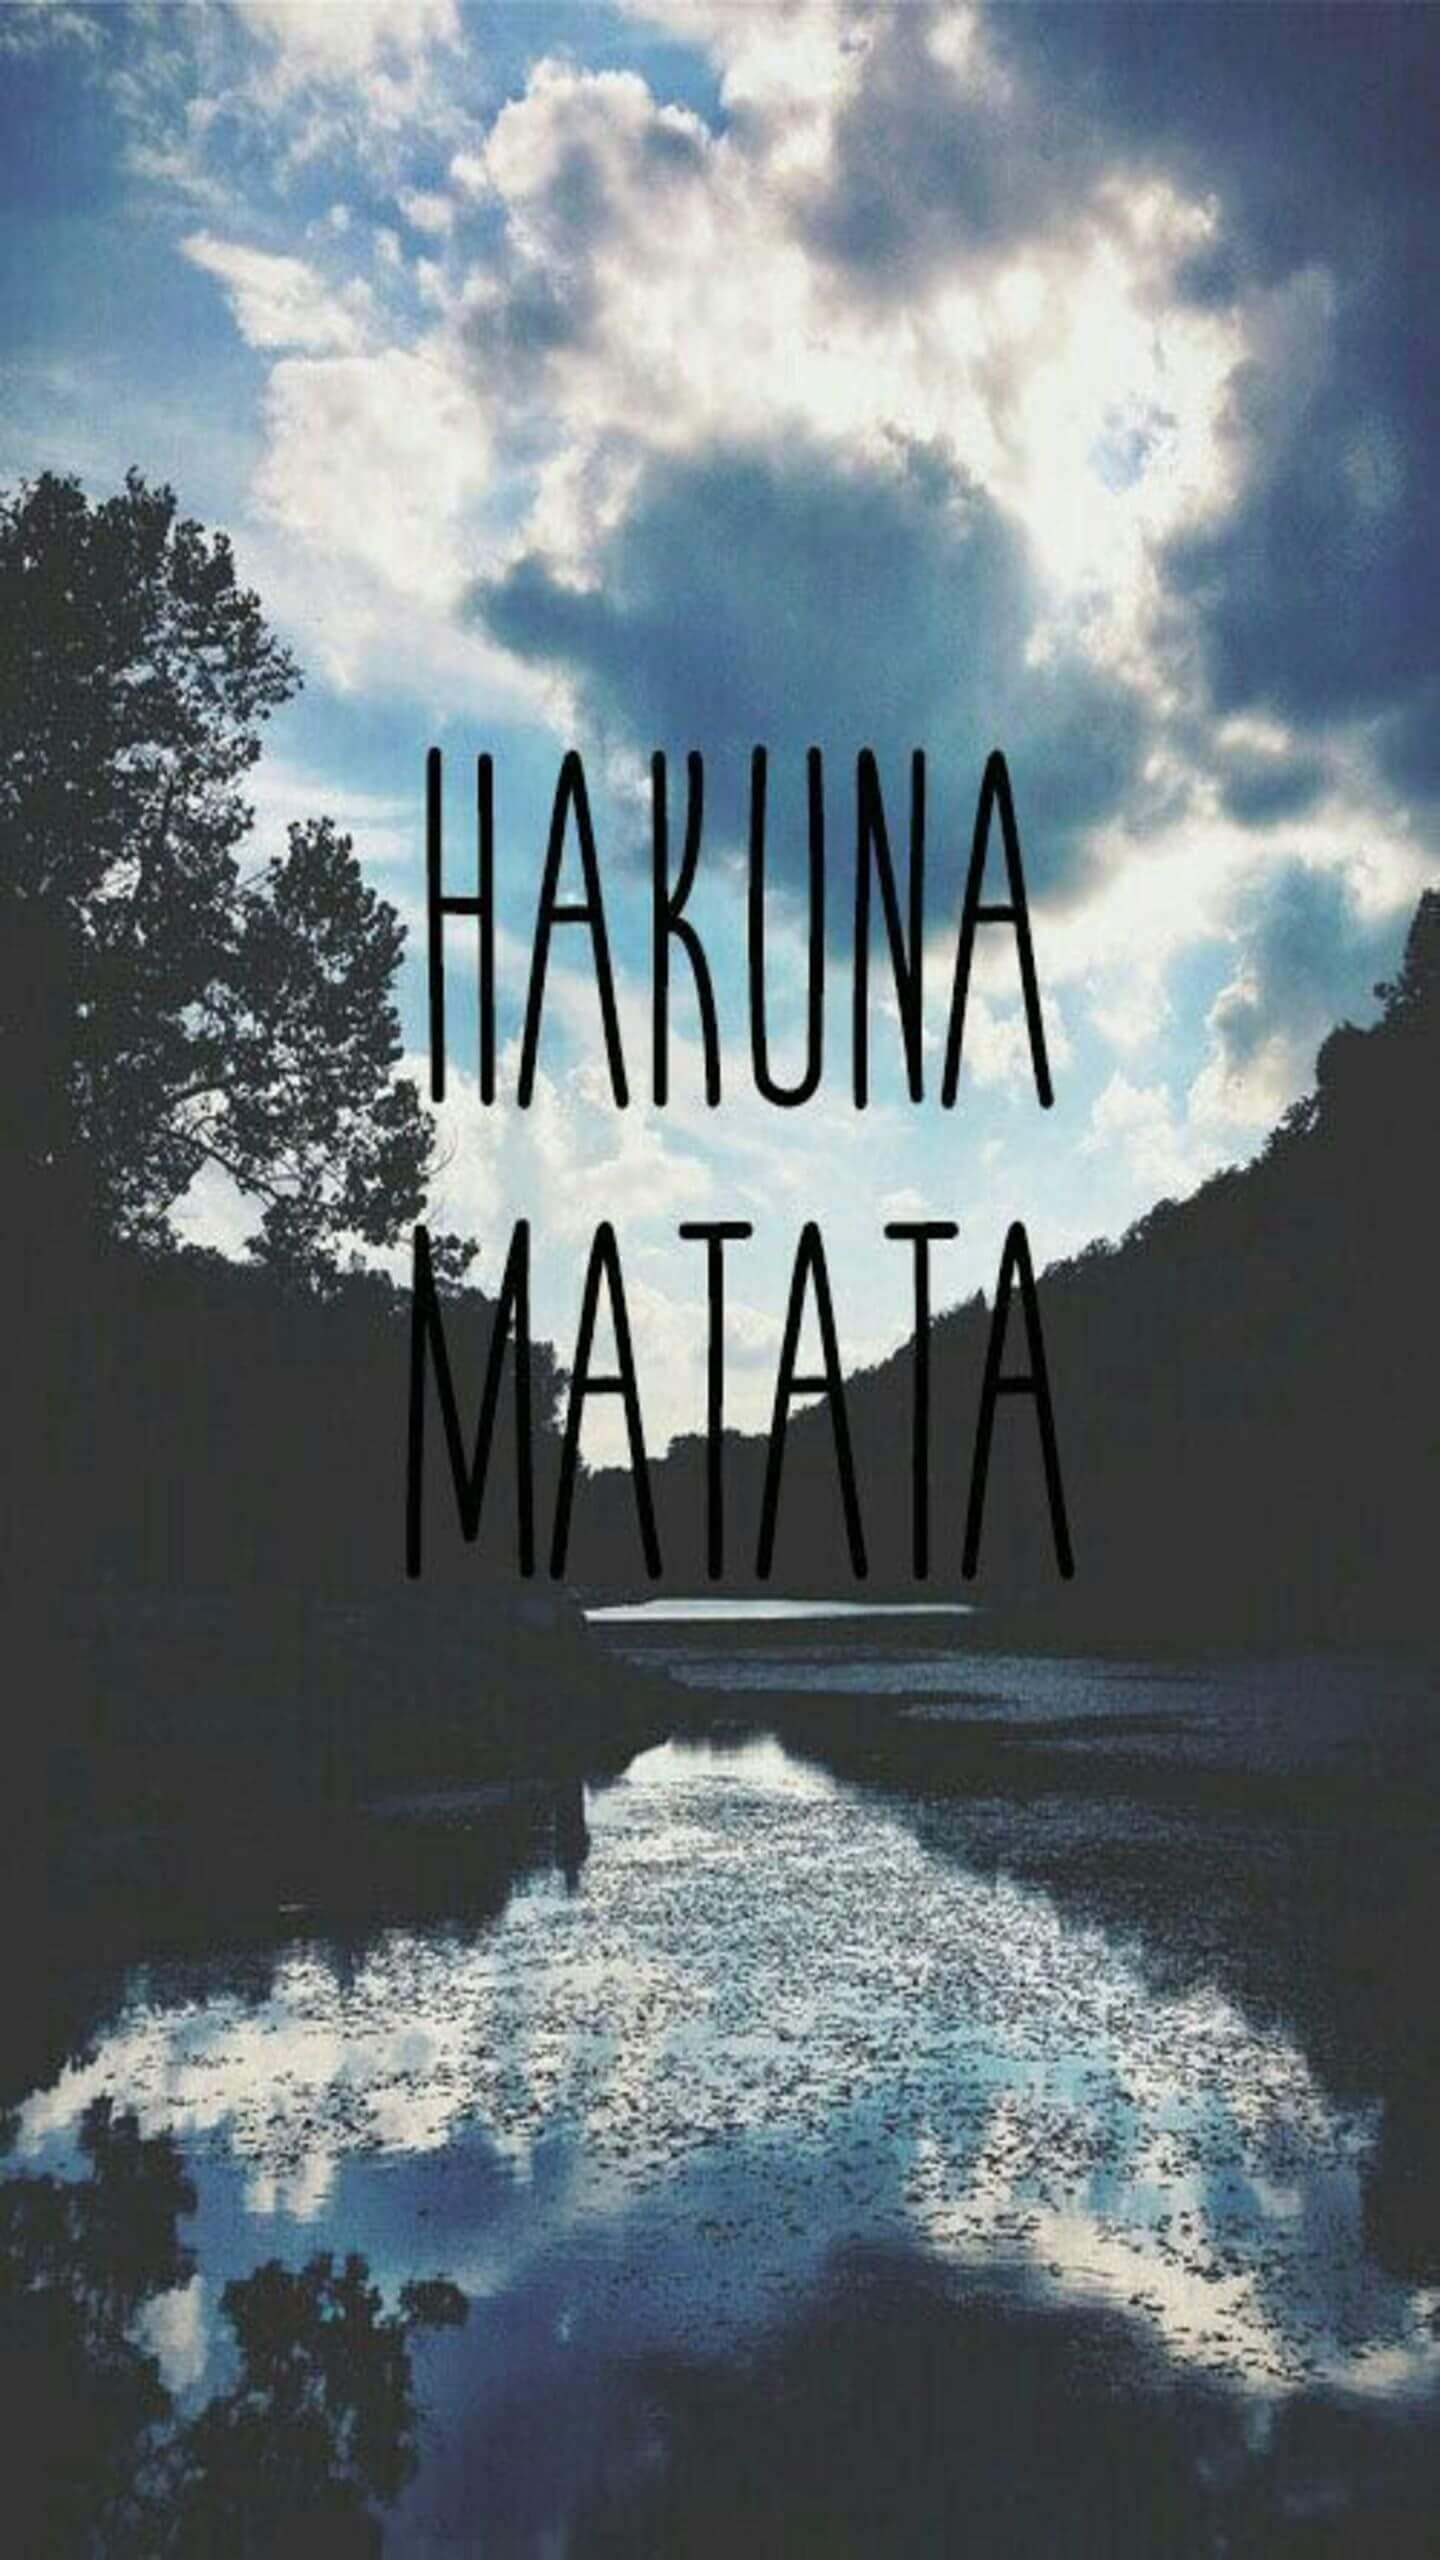 Hakuna Matata Wallpapers For Android Apk Download